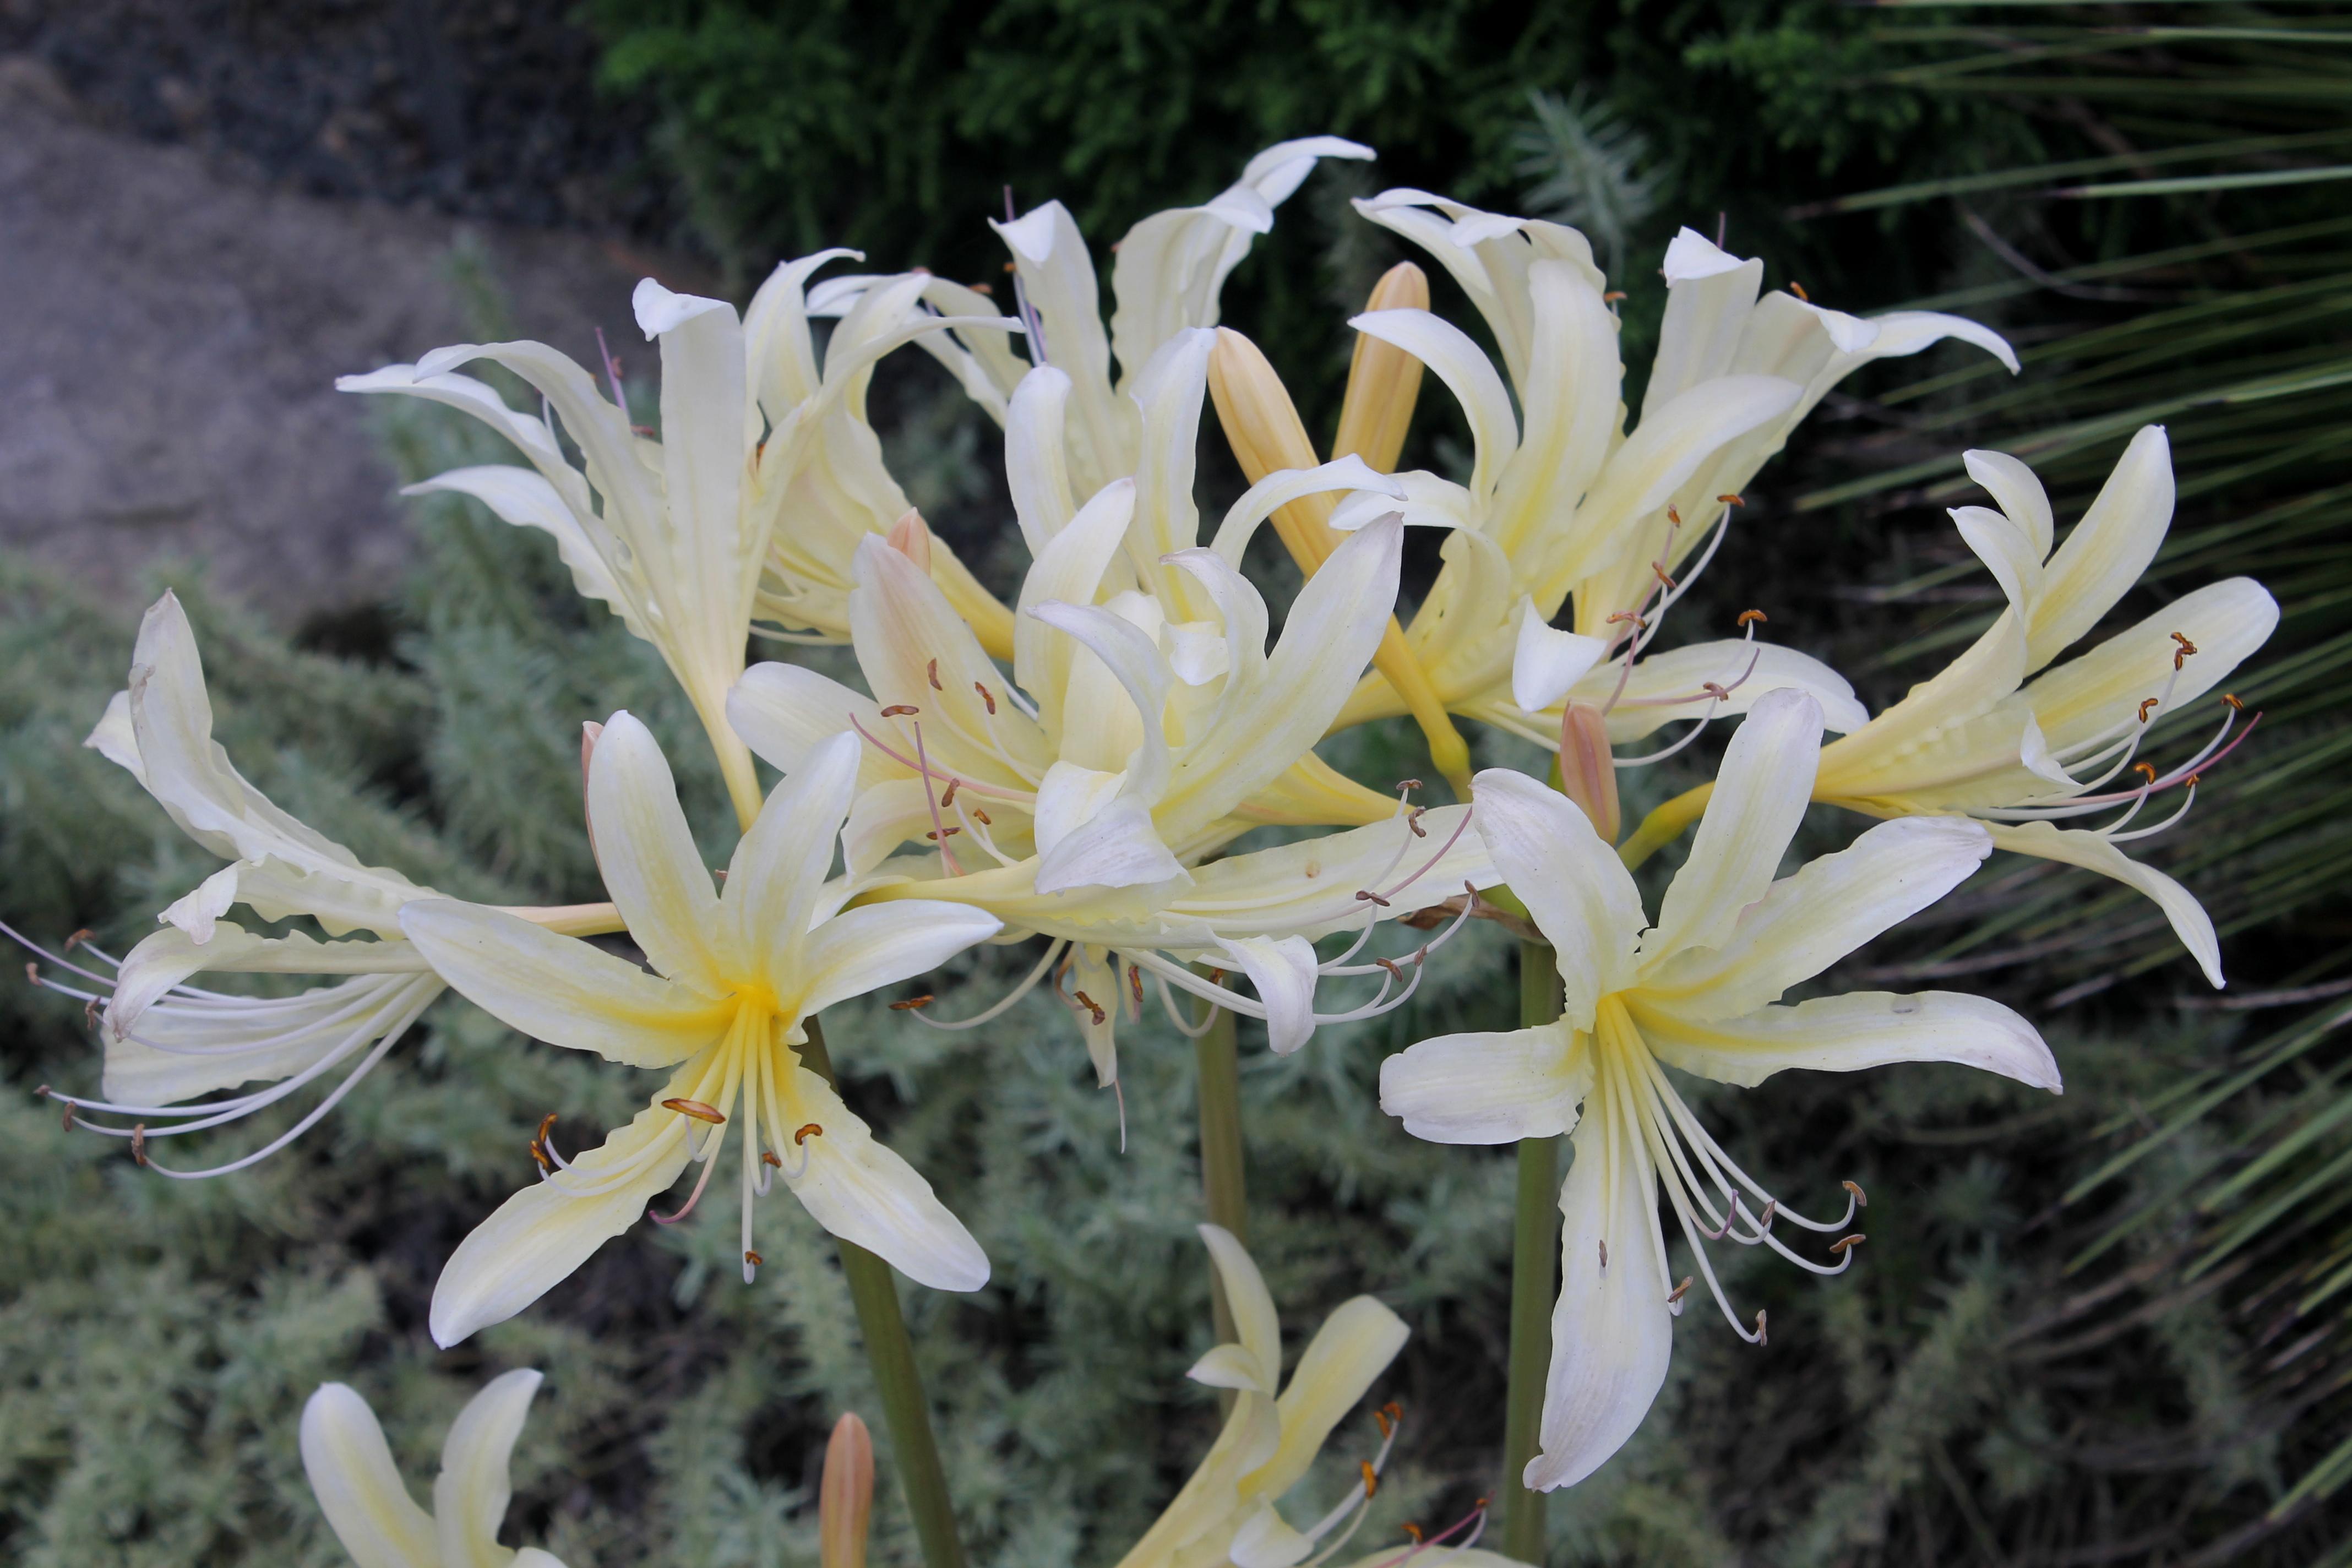 Lycoris x caldwellii 'Sky over Sky' @ JLBG - a hybrid of Lycoris chinensis x longituba